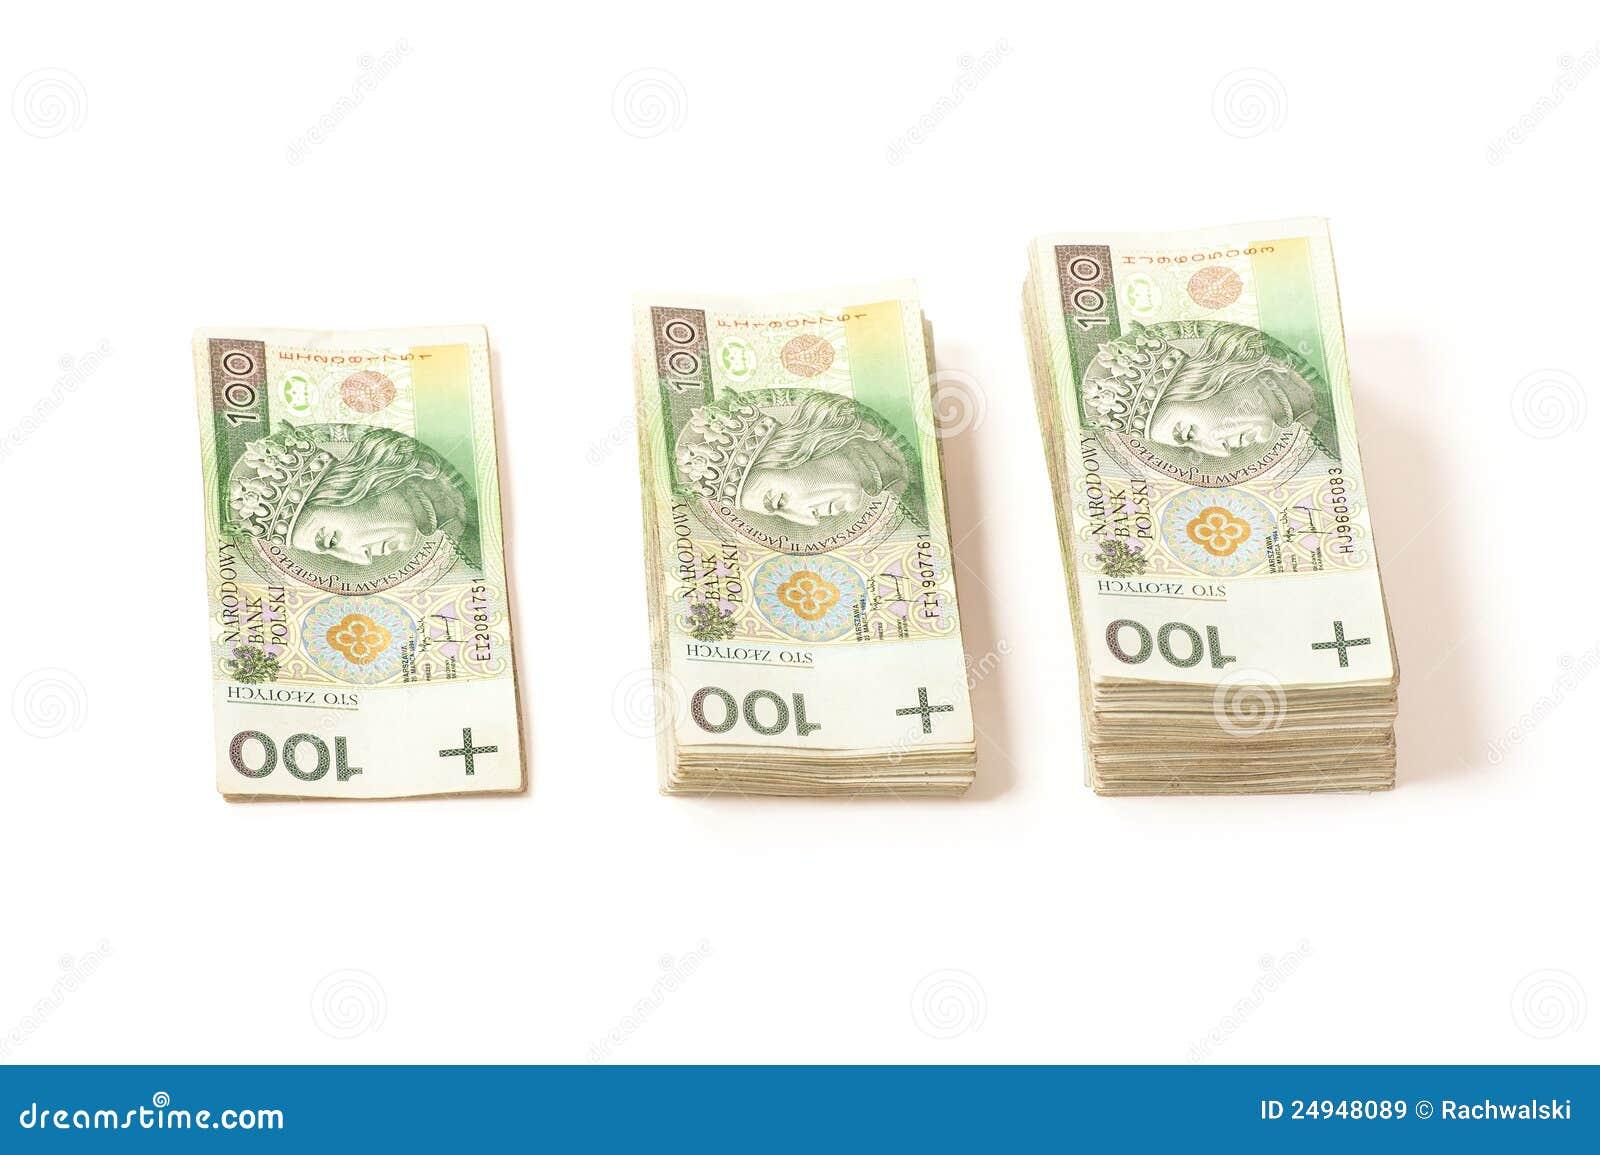 uses of money essay